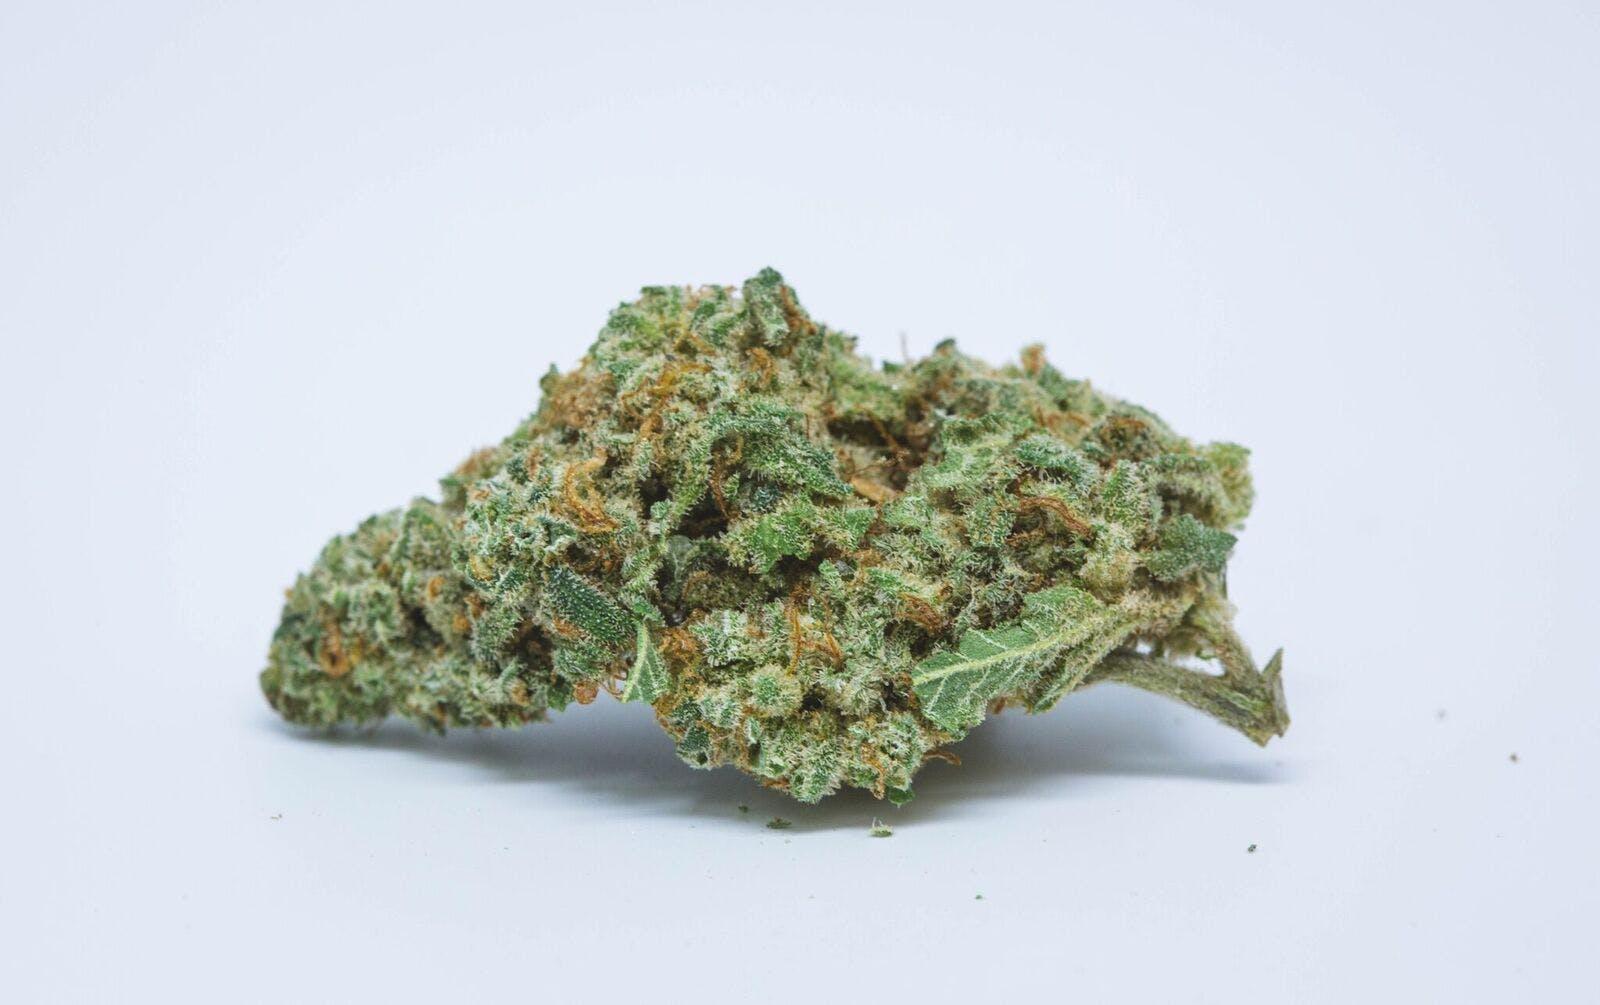 Sour Banana Sherbet Weed; Sour Banana Sherbet Cannabis Strain; Sour Banana Sherbet Hybrid Marijuana Strain